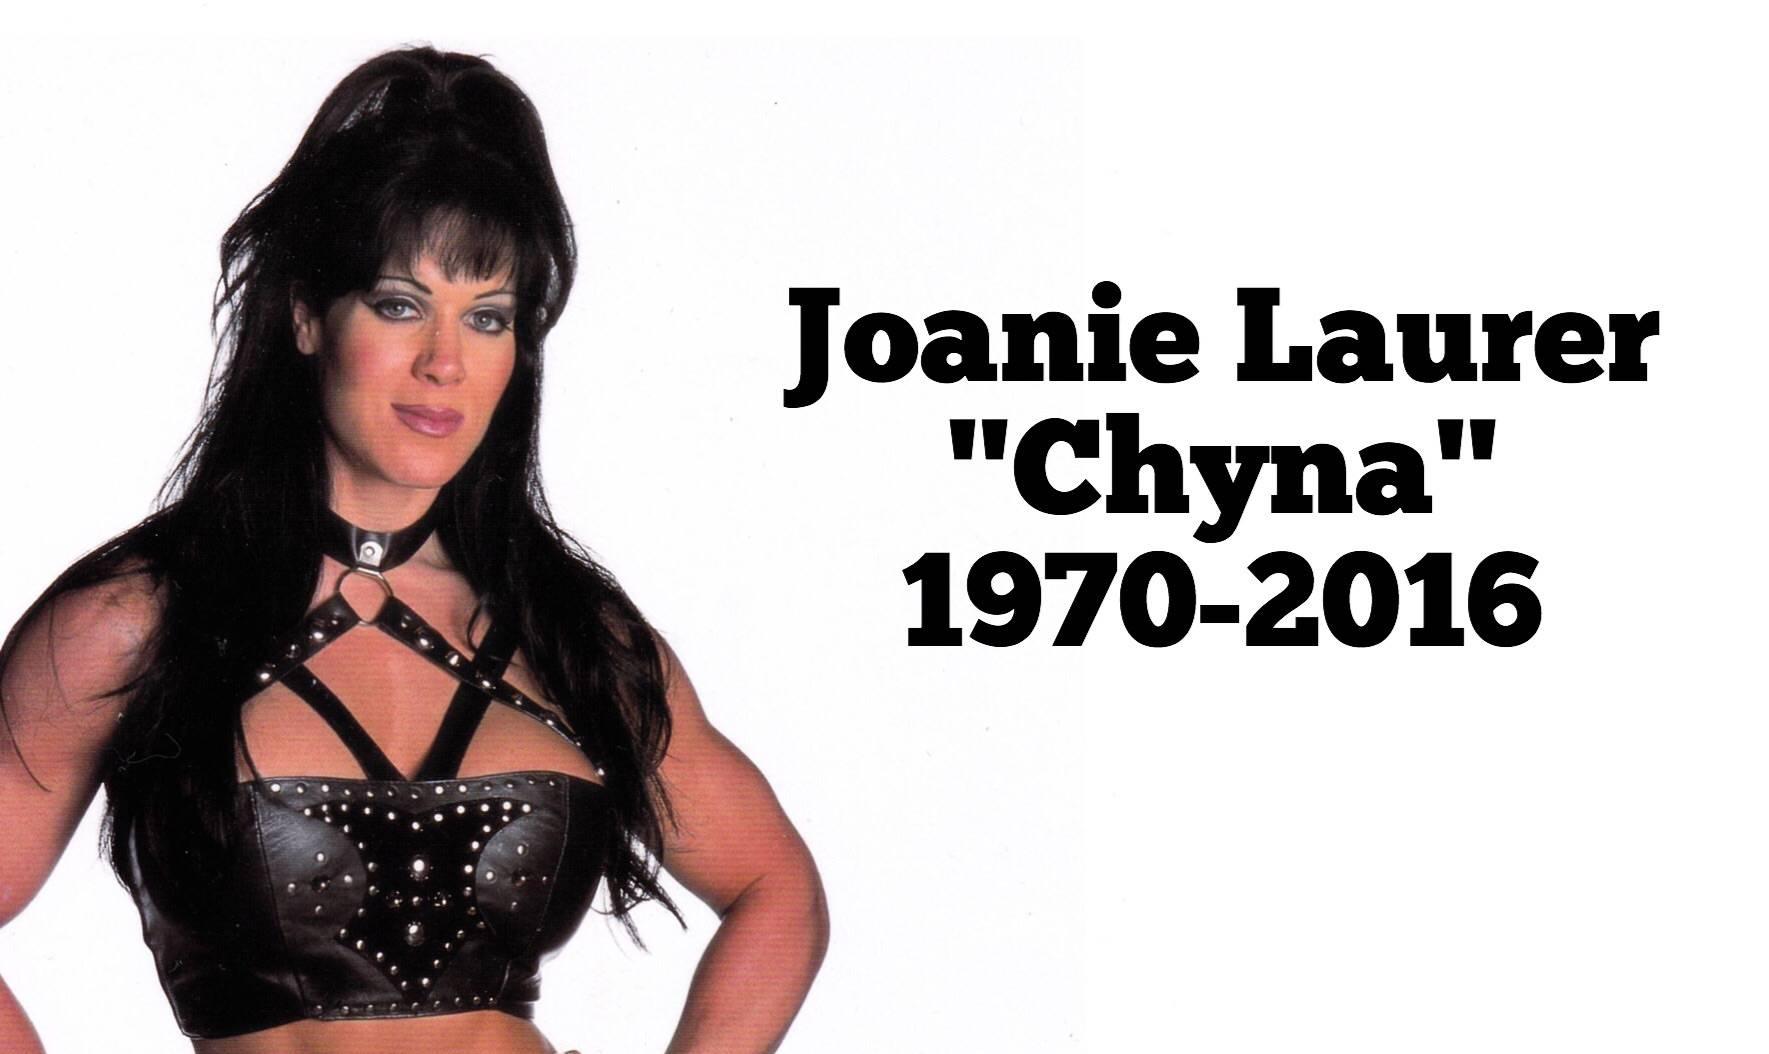 Legendary wwe women s champion wrestler chyna has been found dead in